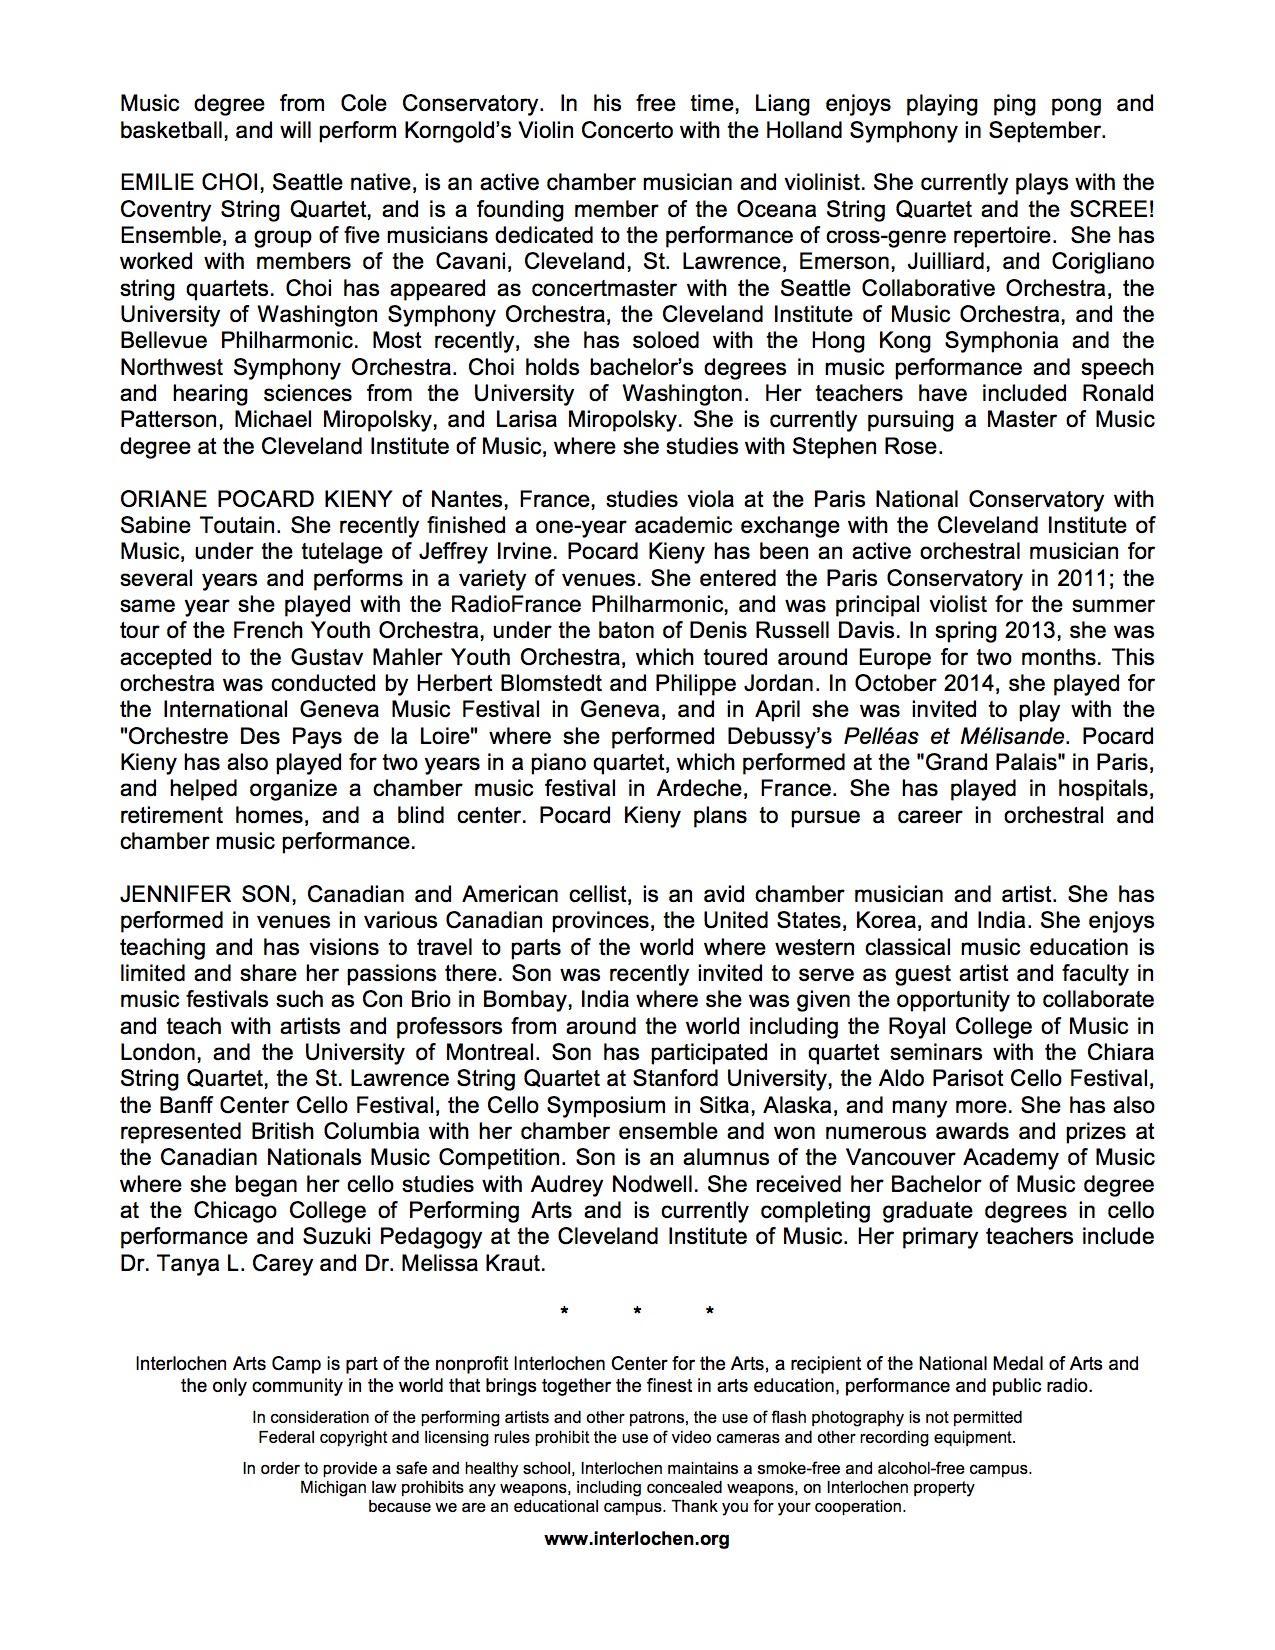 Scarlet letter theme essay